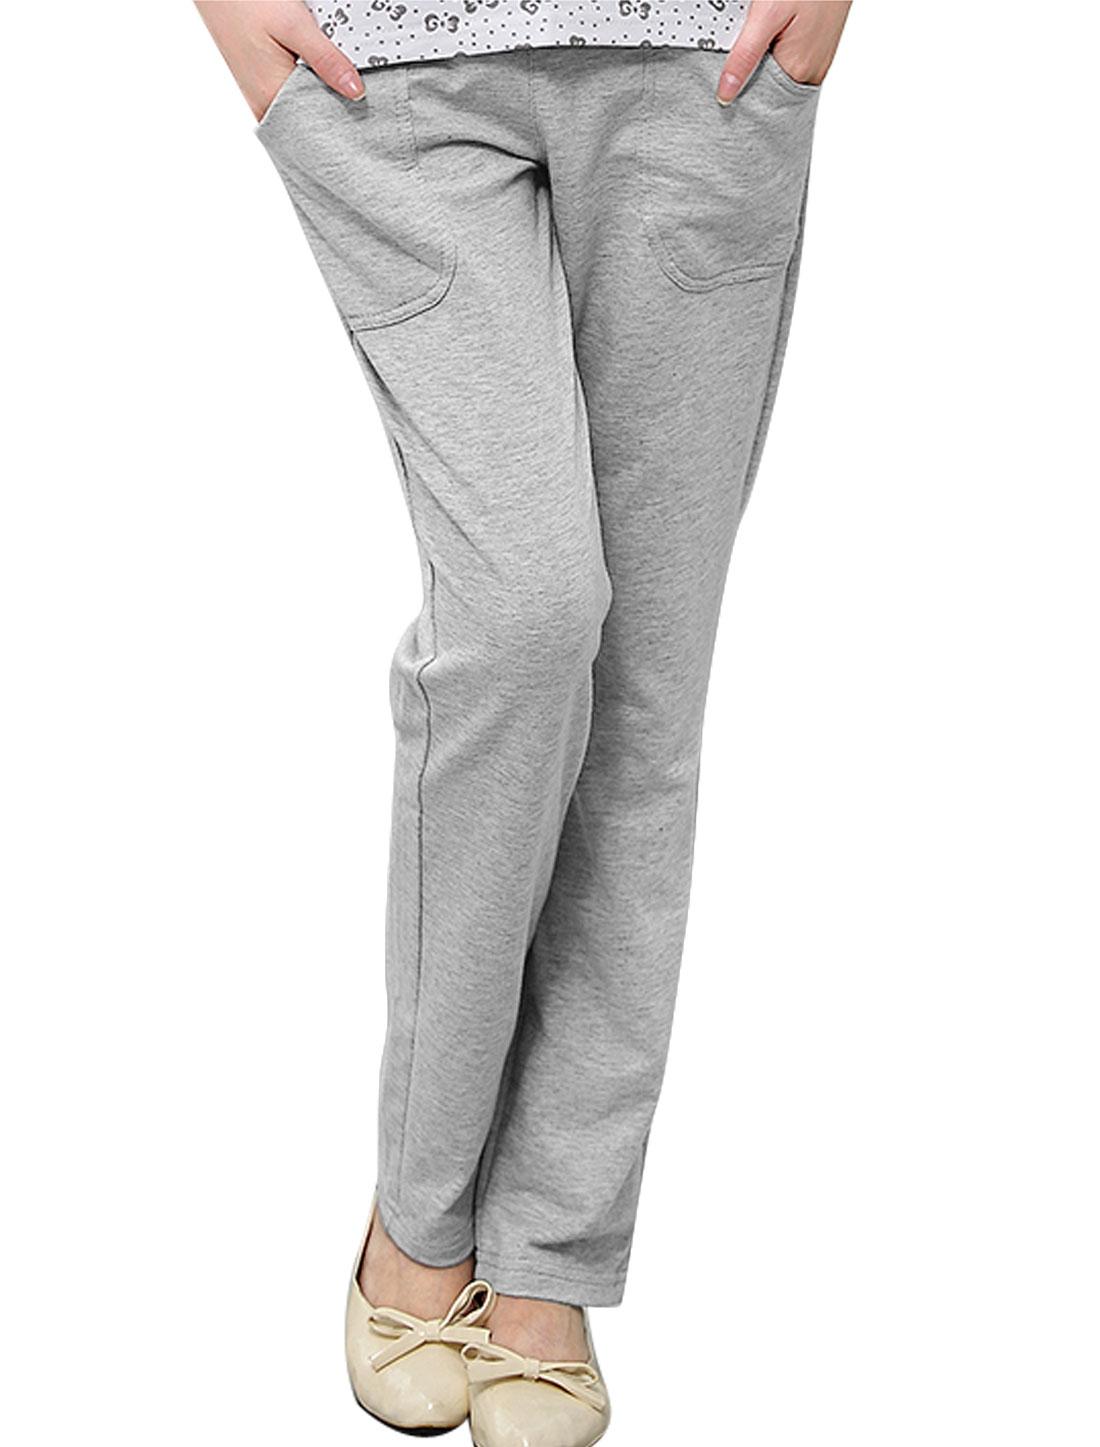 Maternity Double Slant Pockets Fleece Lined Casual Pants Light Gray XS